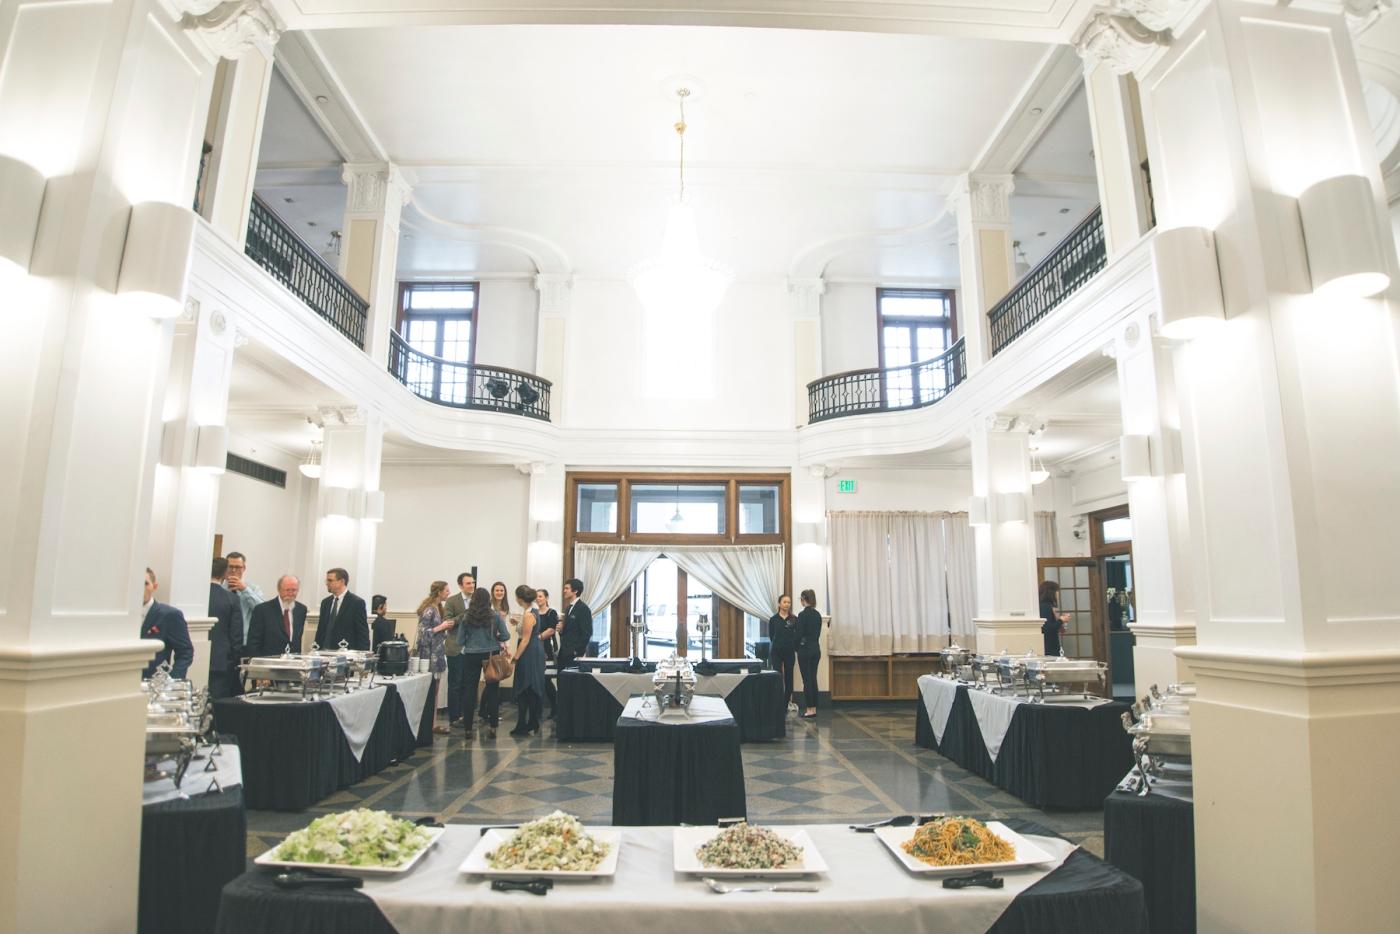 DSC_3108Everett_Wedding_Ballroom_Jane_Speleers_photography_Rachel_and_Edmund_reception_2017